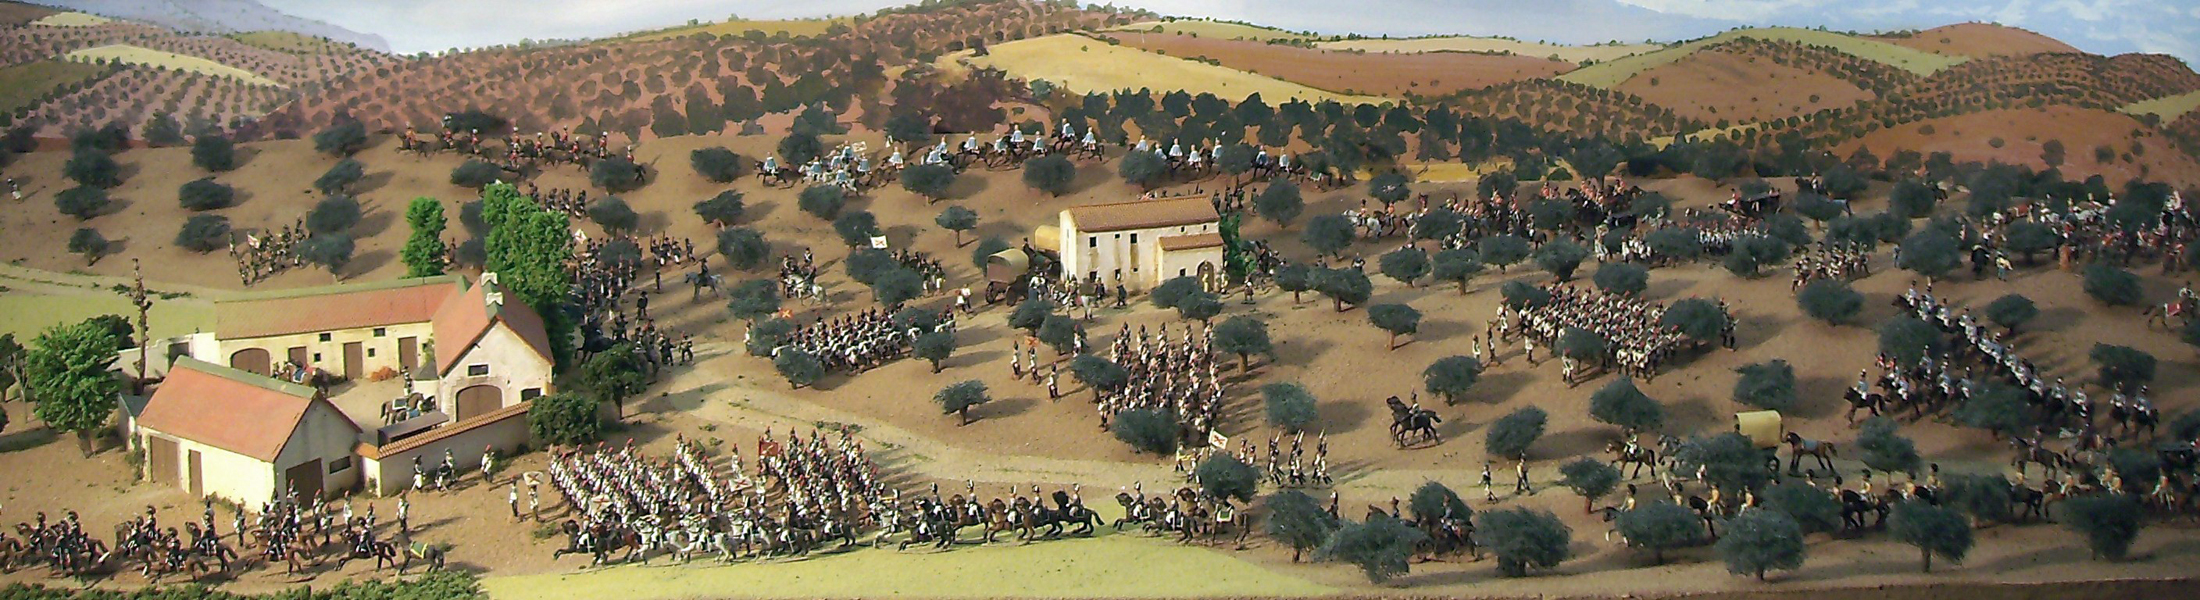 La época napoleónica